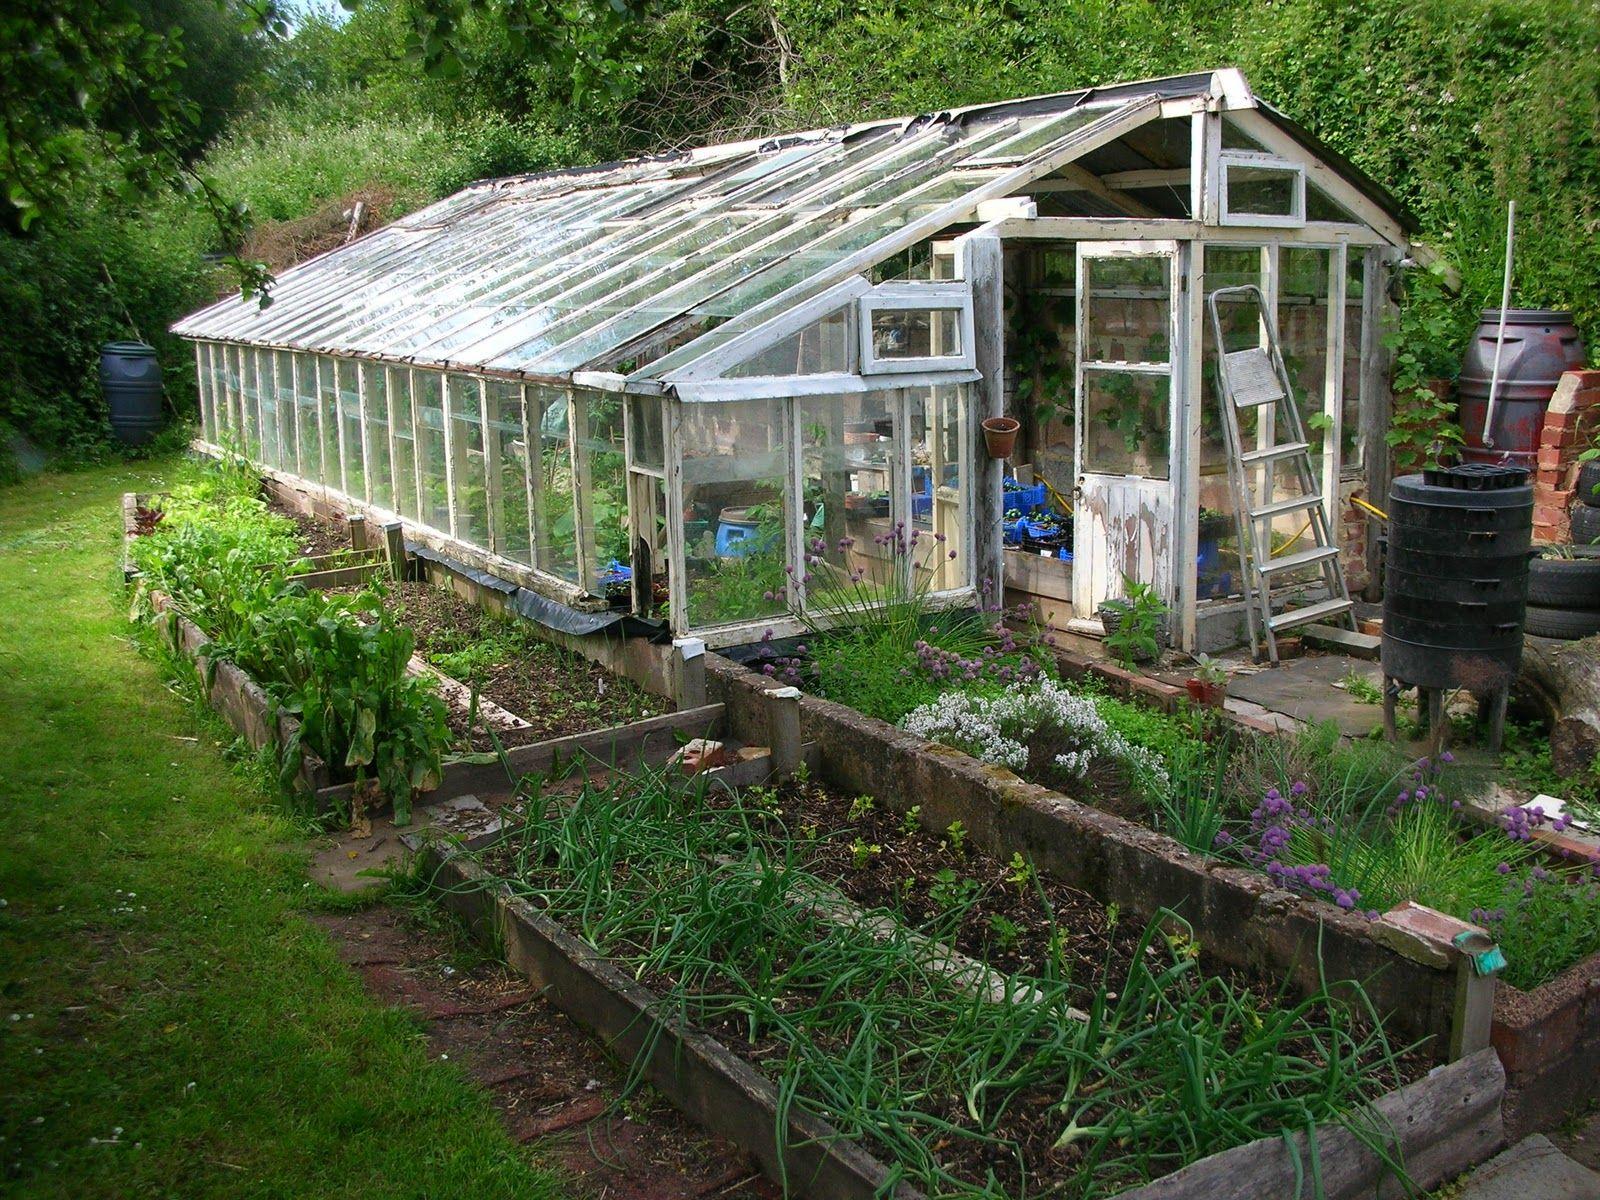 Large Greenhouse Kits Get Home Inteiror House Design Inspiration